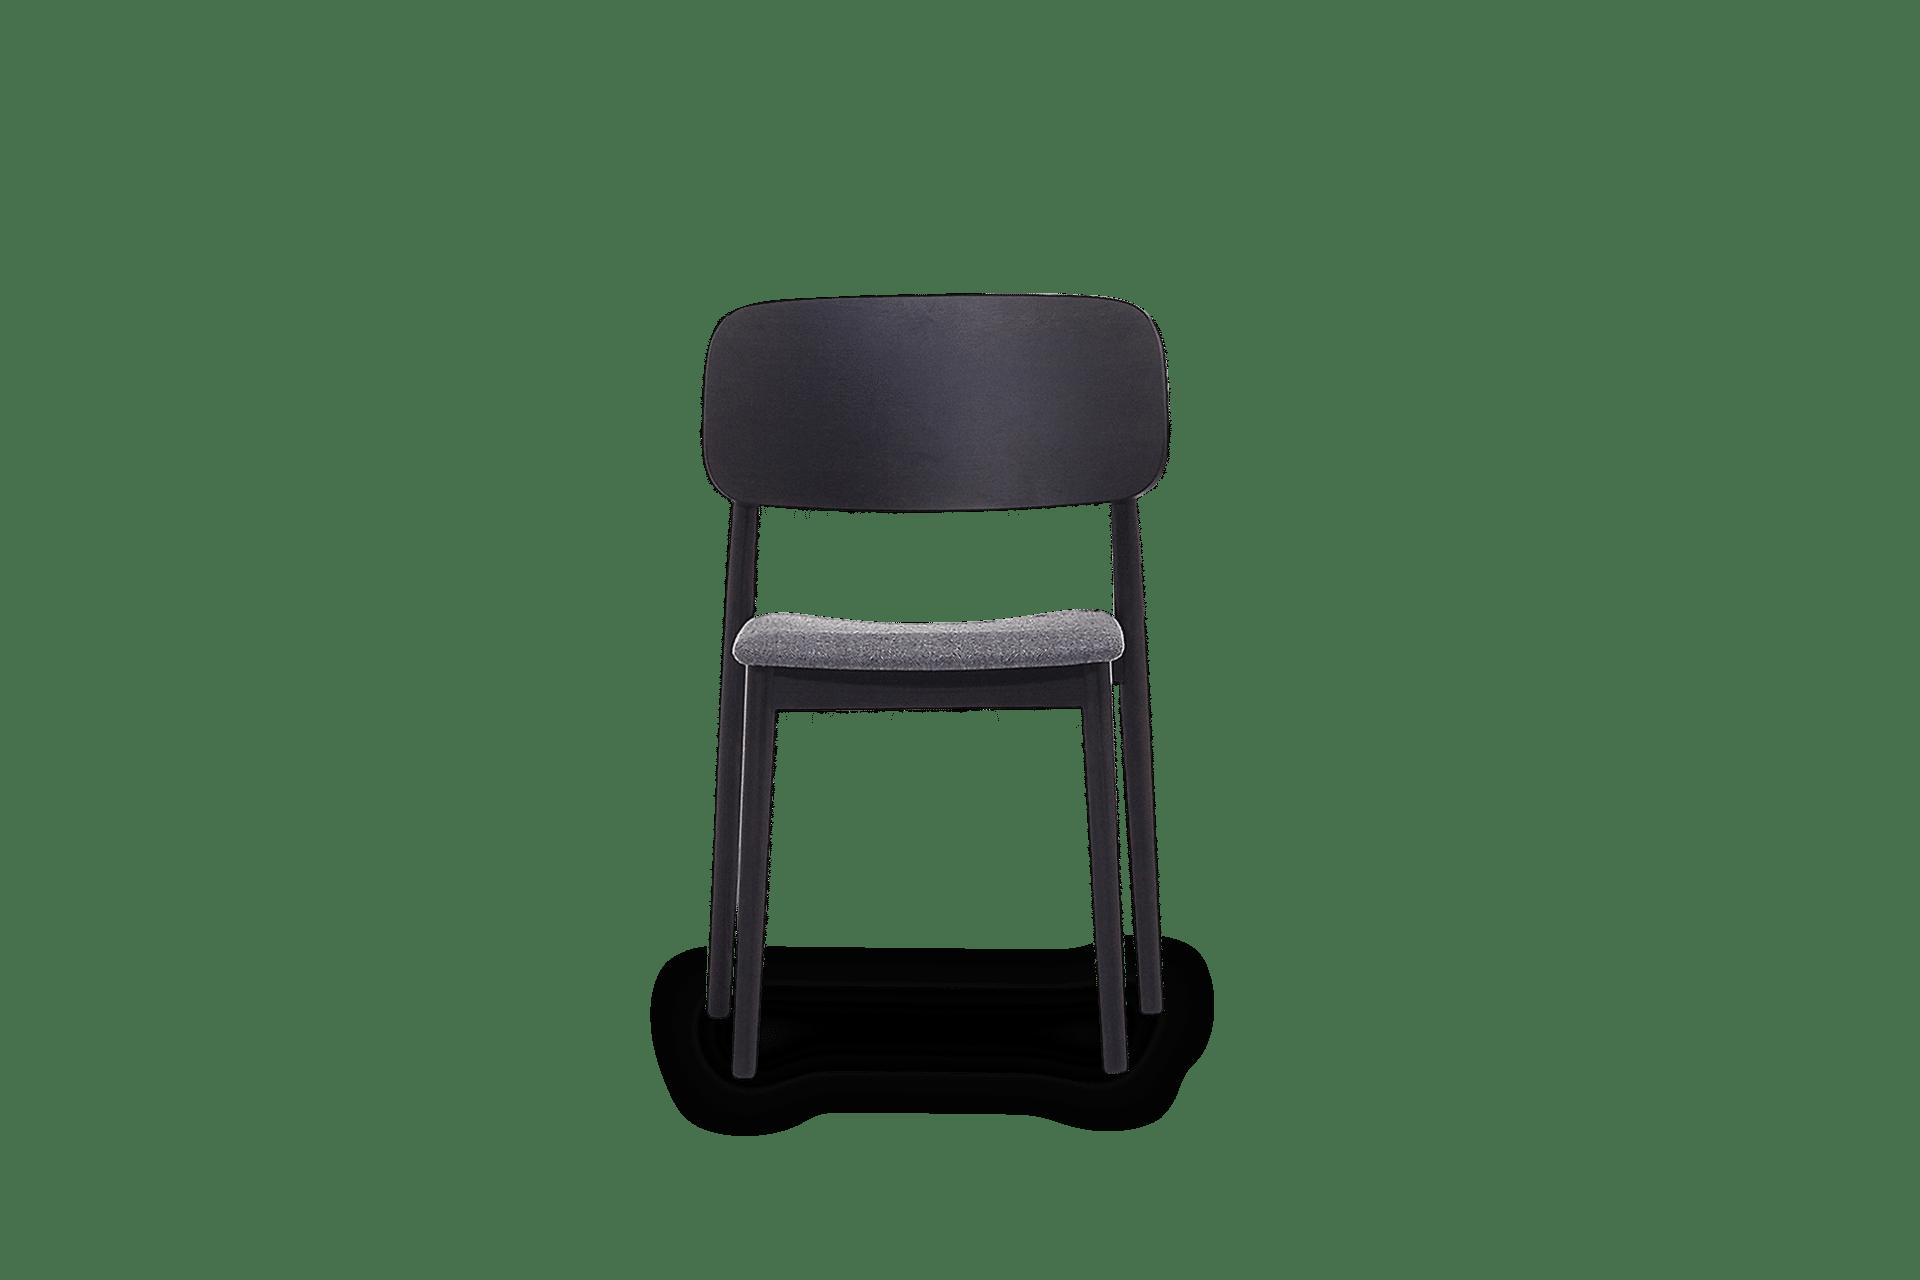 CH Grado Chair black uphol